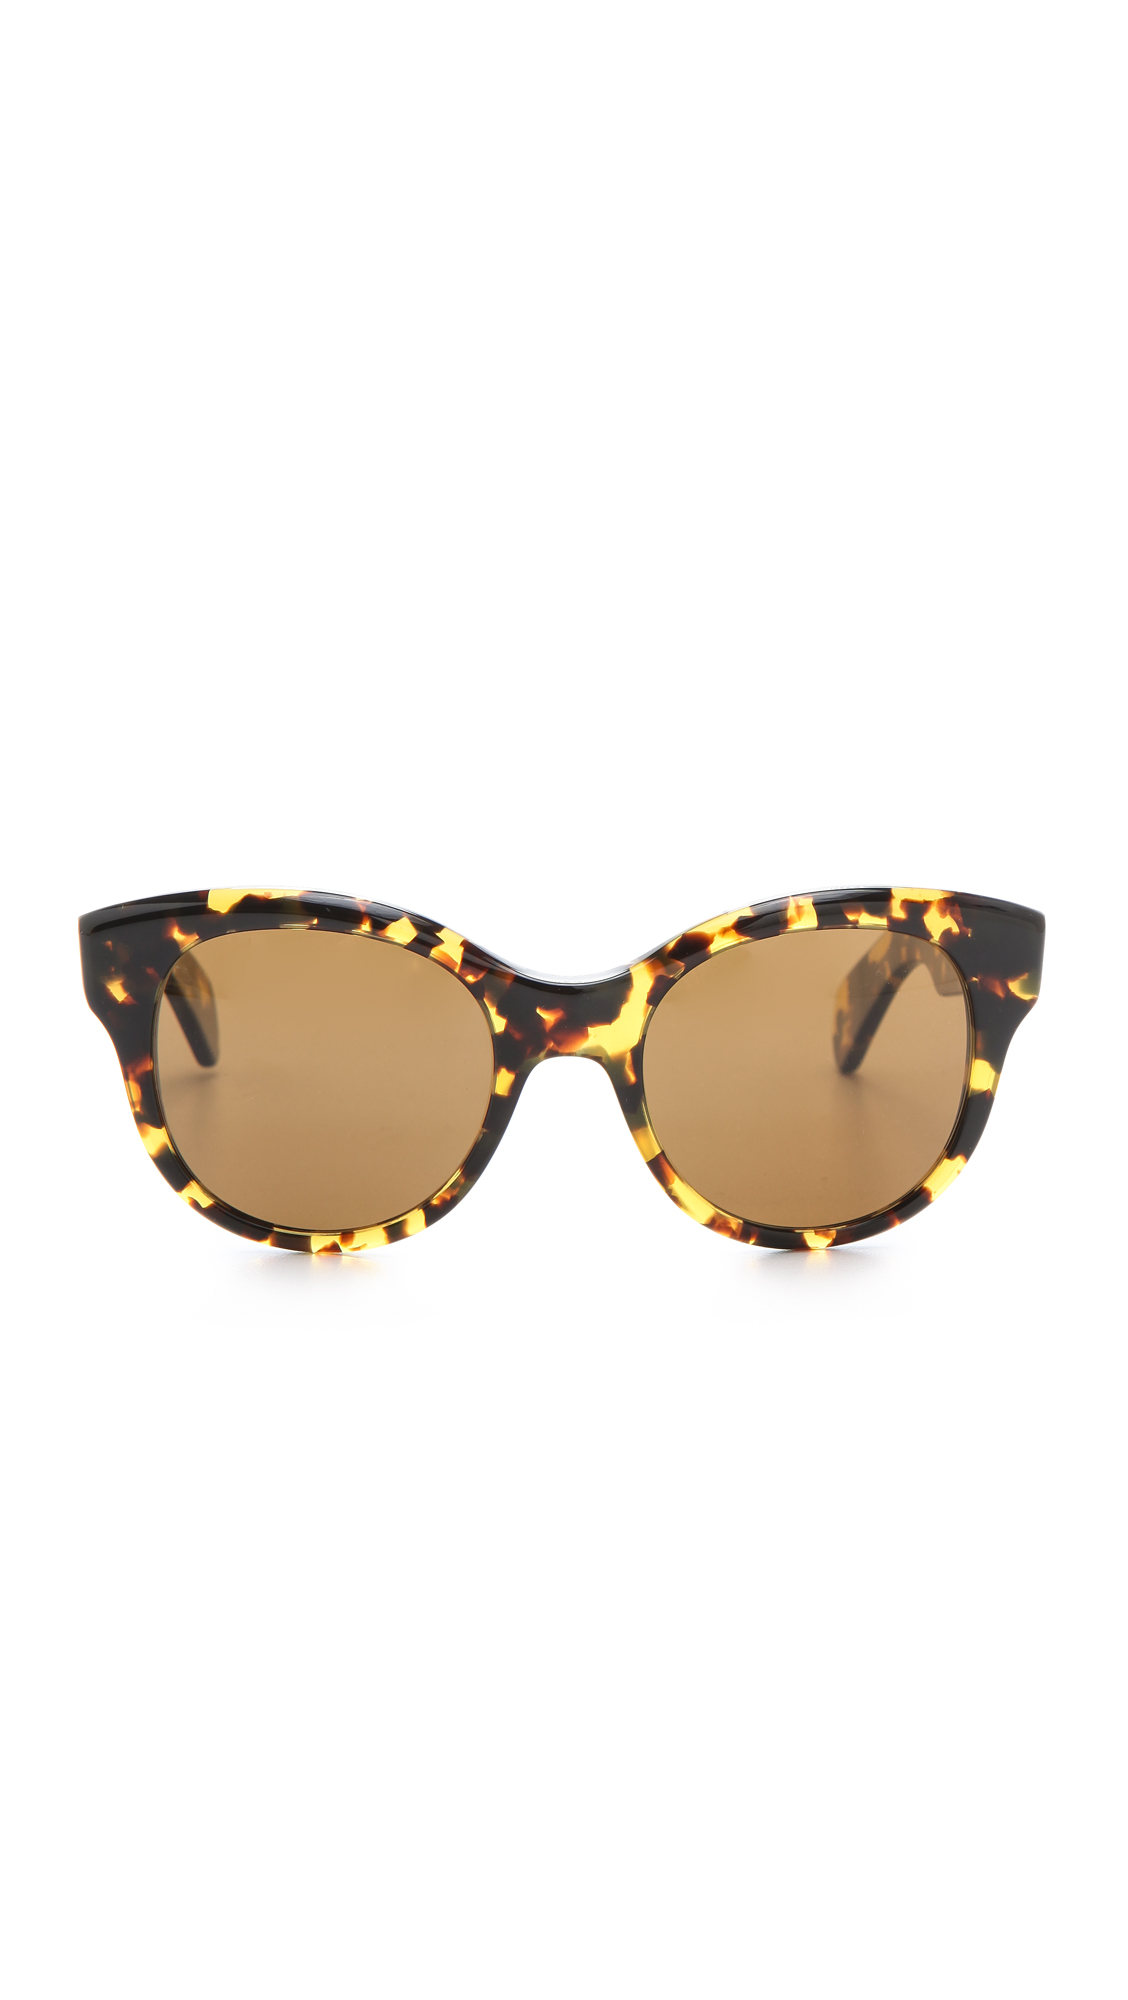 998a38424c Oliver Peoples Eyewear Jacey Polarized Sunglasses